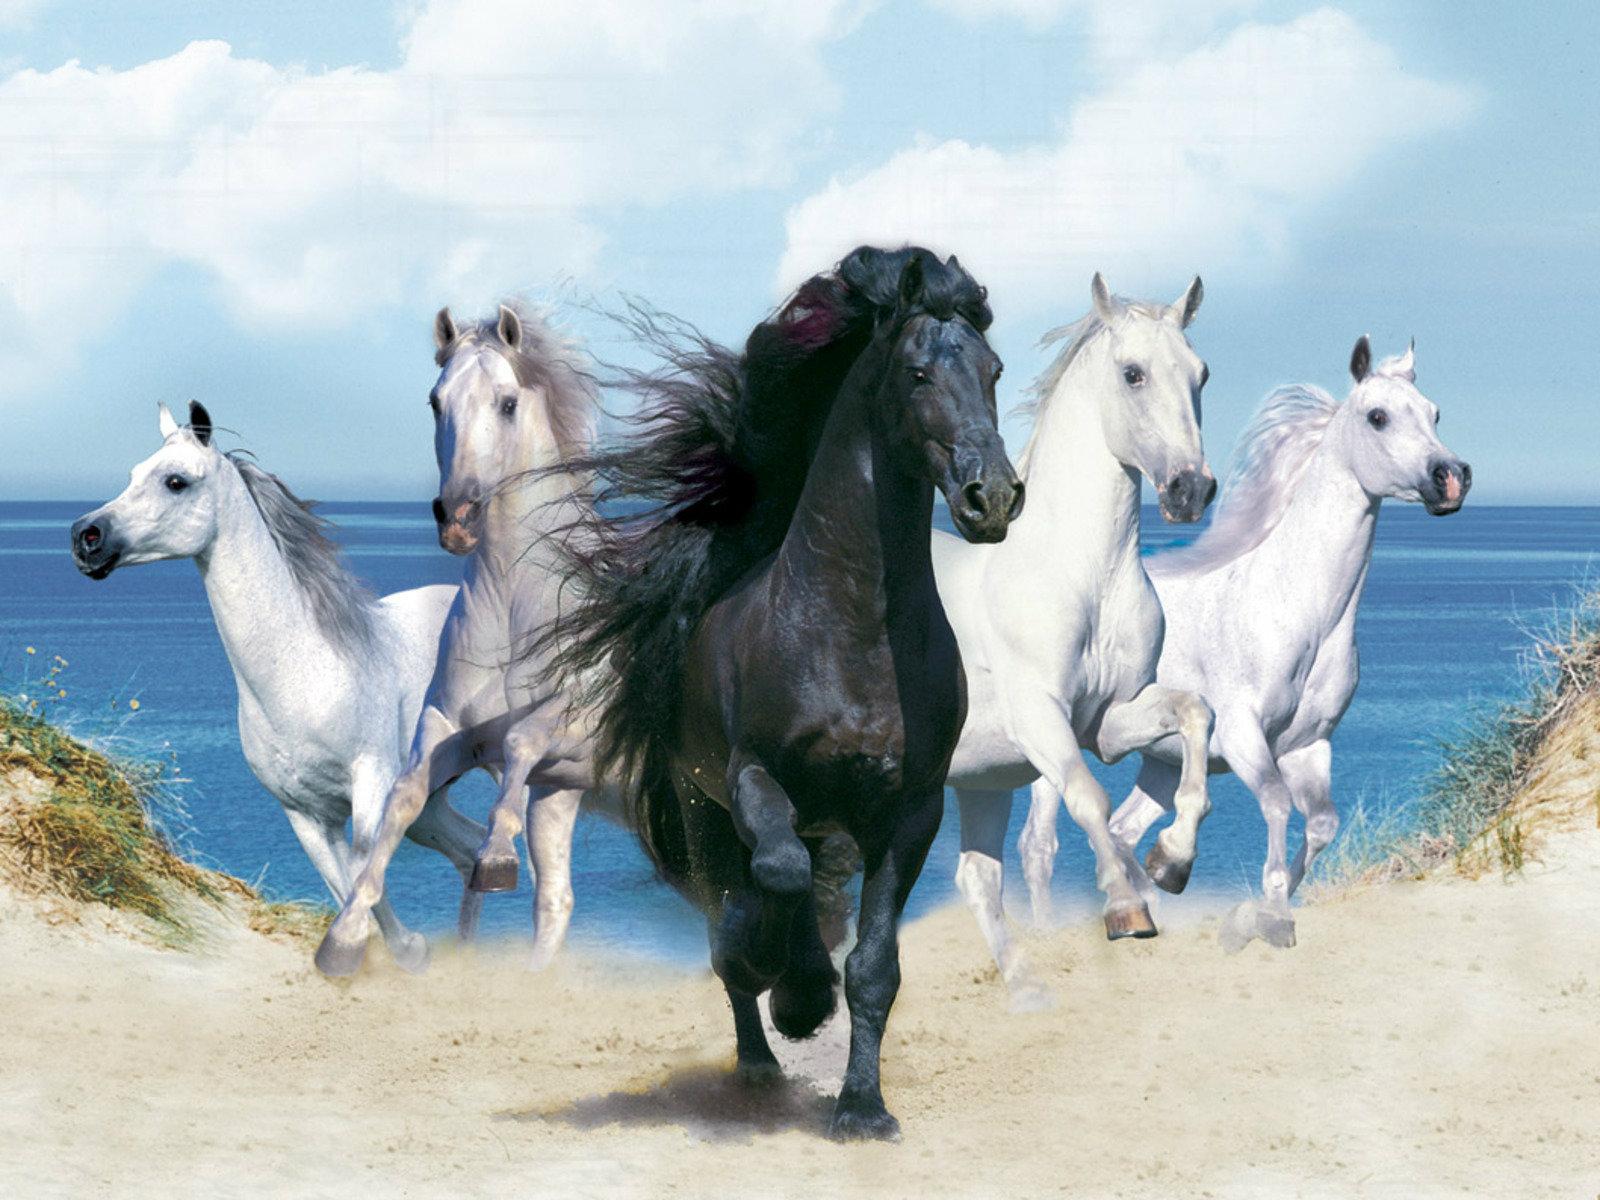 Fantastic   Wallpaper Horse Ultra Hd - Black-Horse-Wallpaper-With-White-Horses  Trends_6610082.jpg